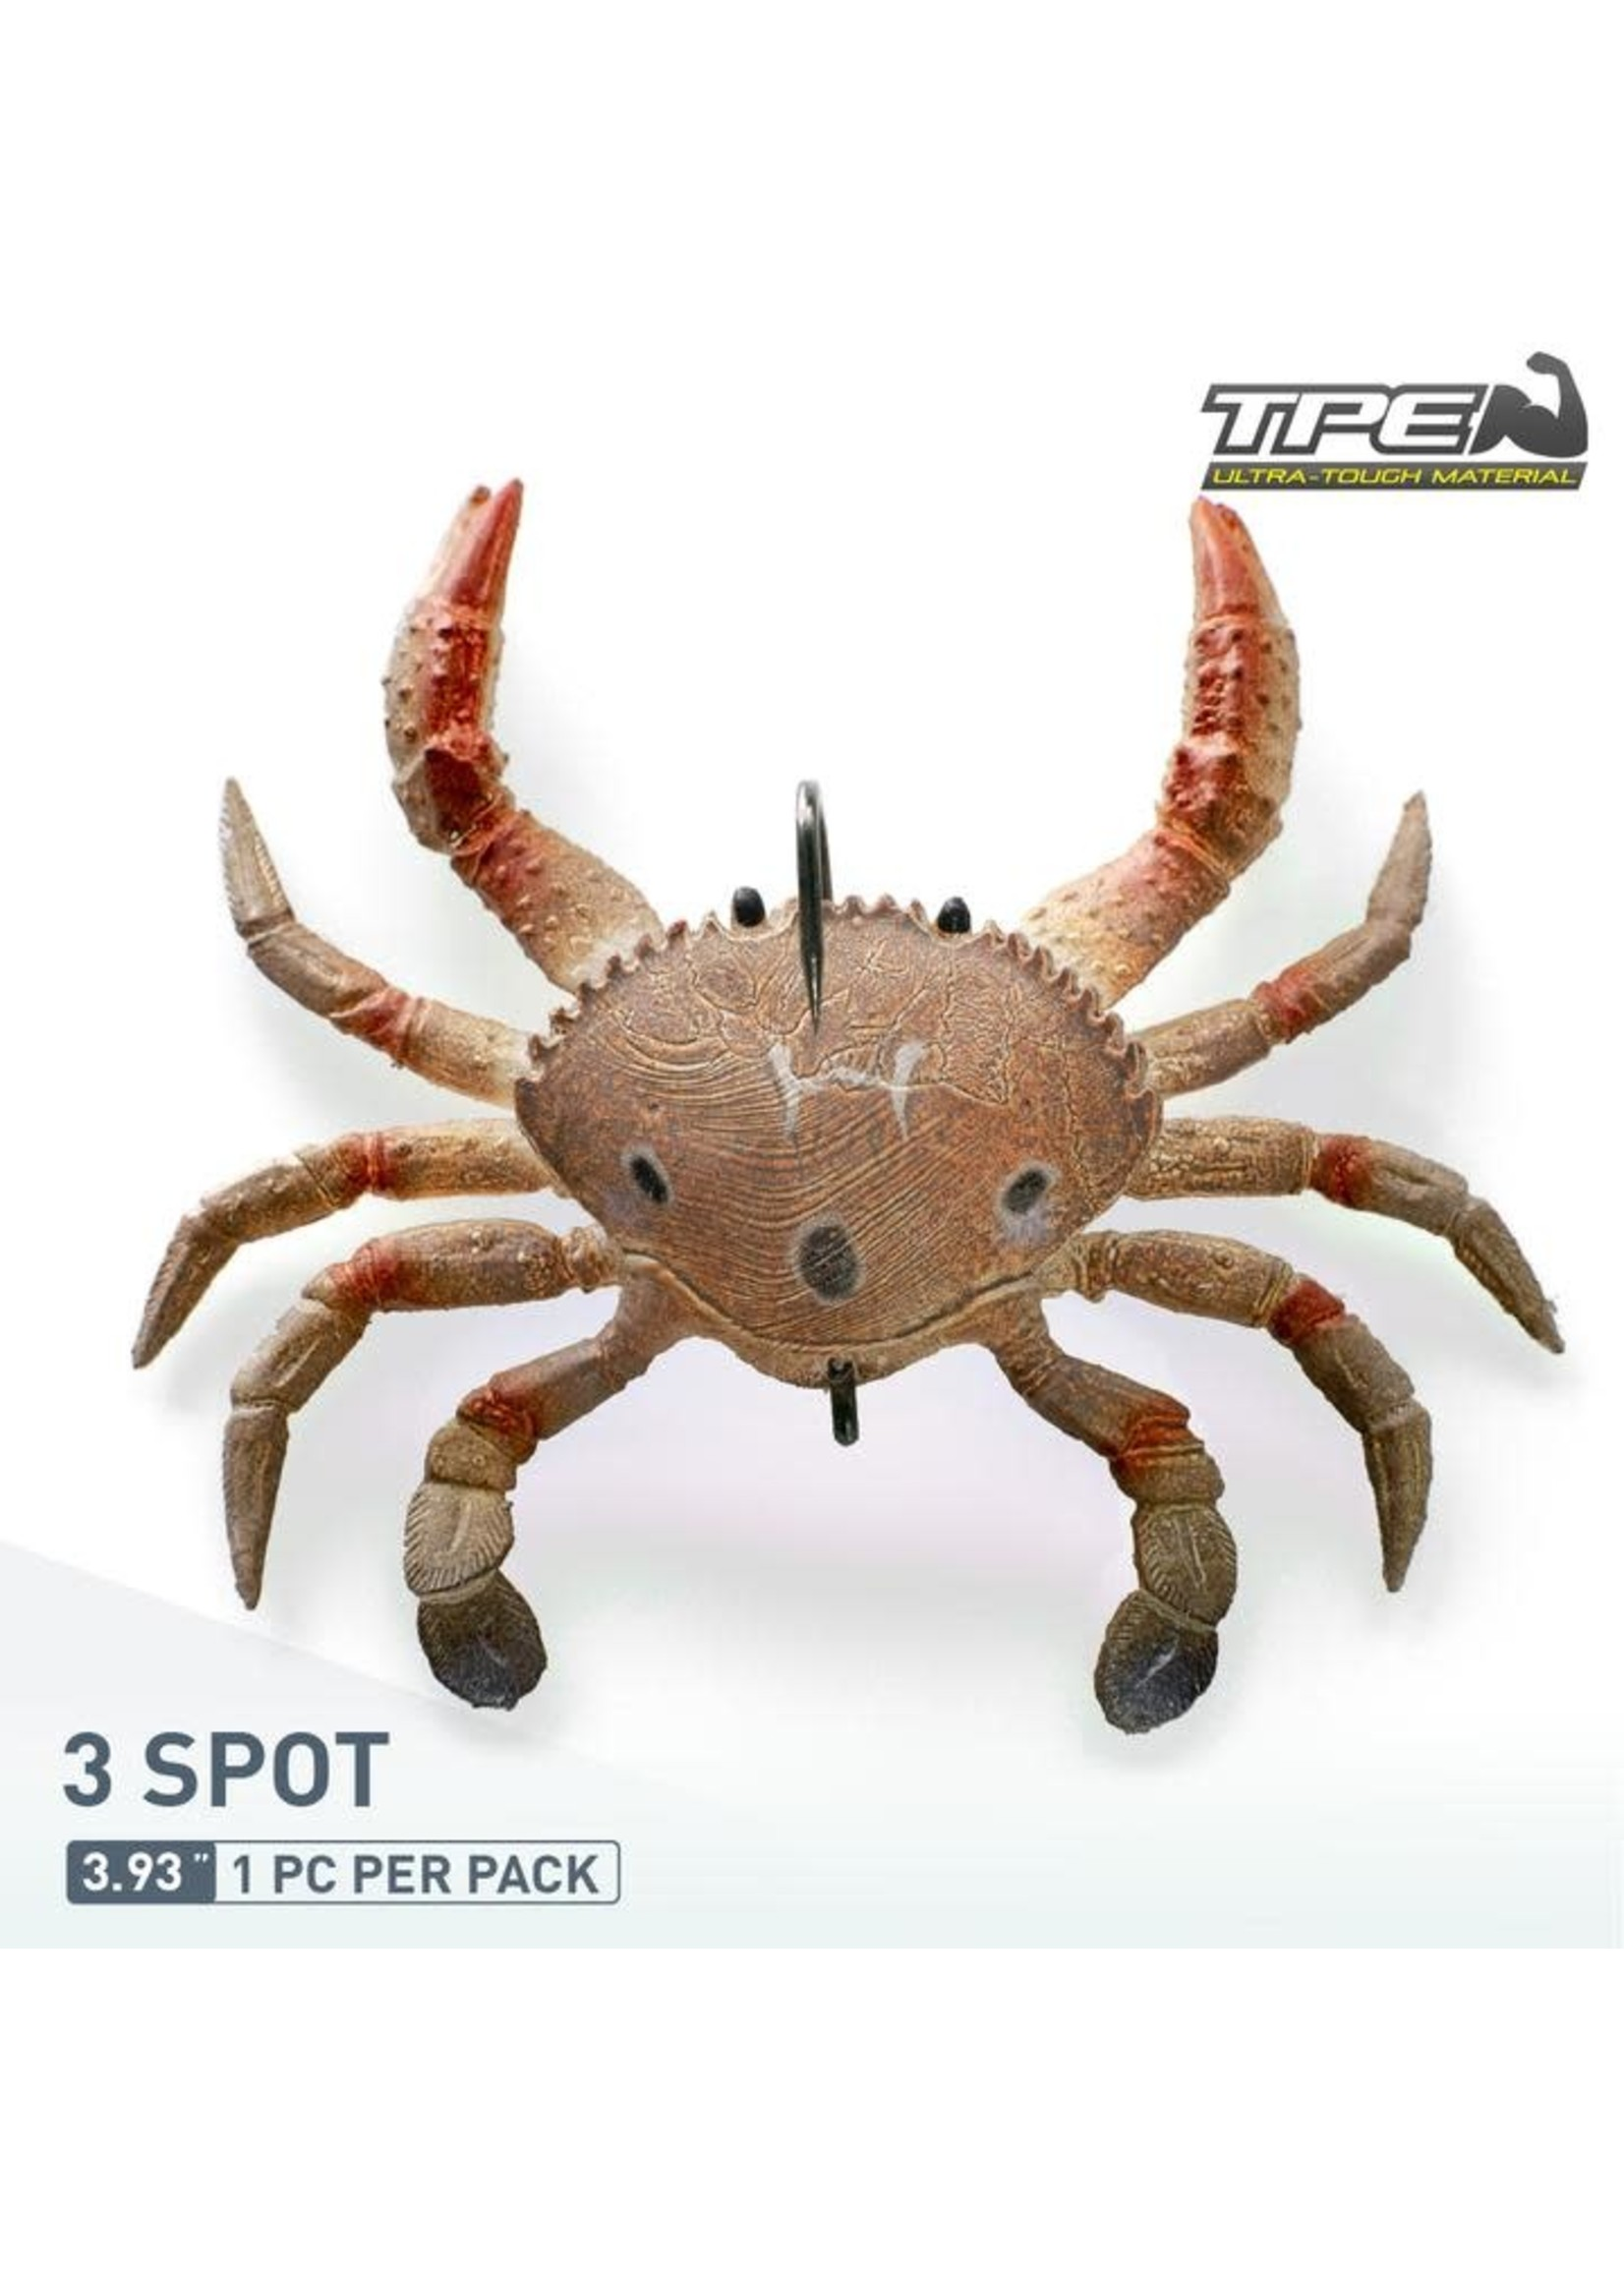 "ChaseBaits Smash Crab 4"" 3 Spot"